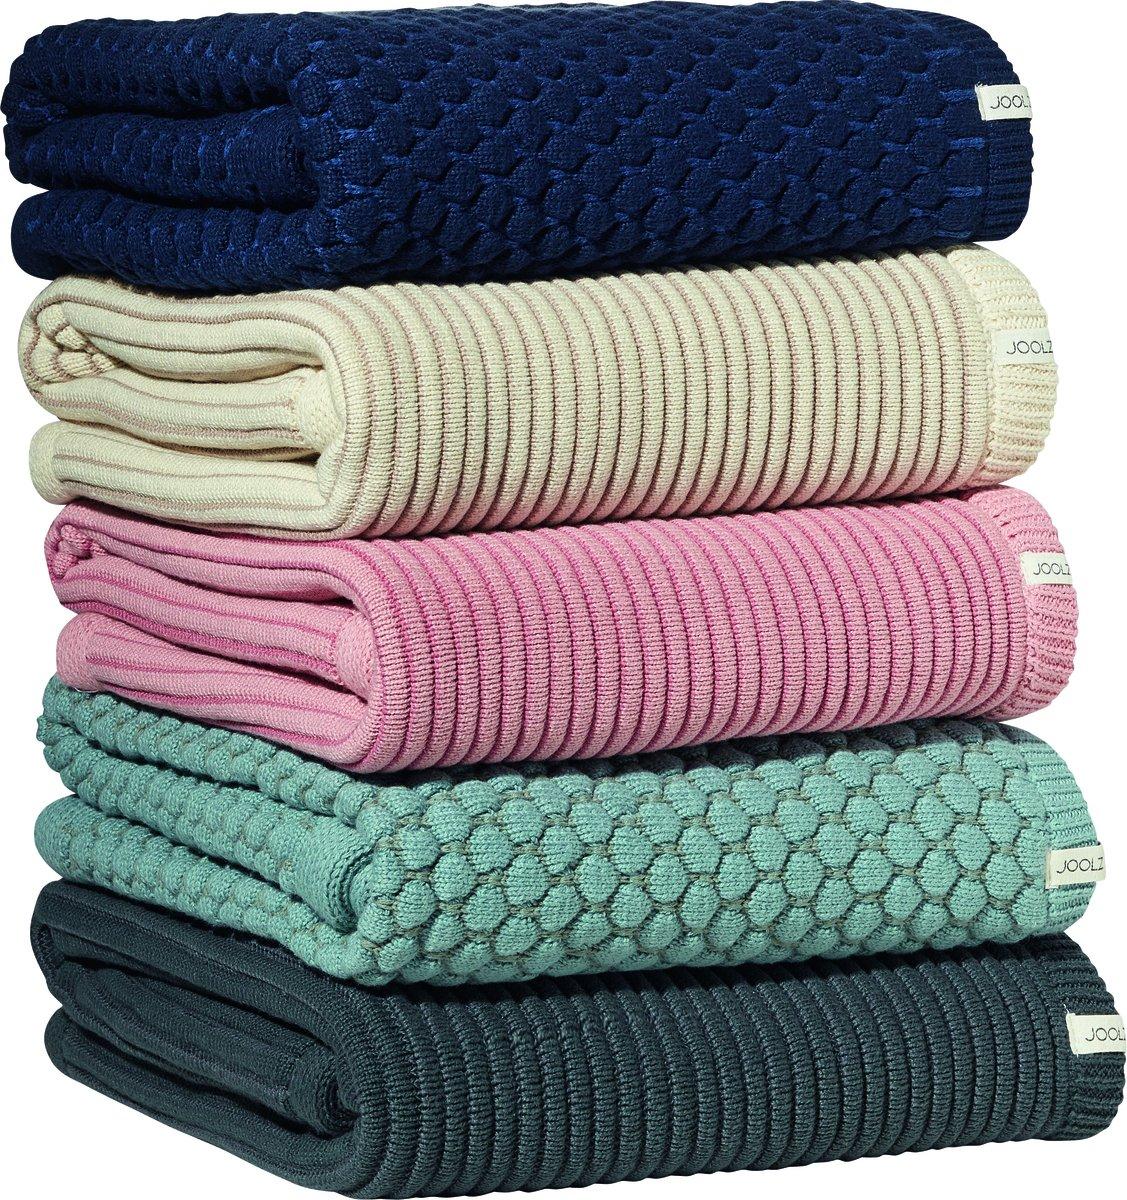 Blue Joolz Essentials Ribbed Blanket